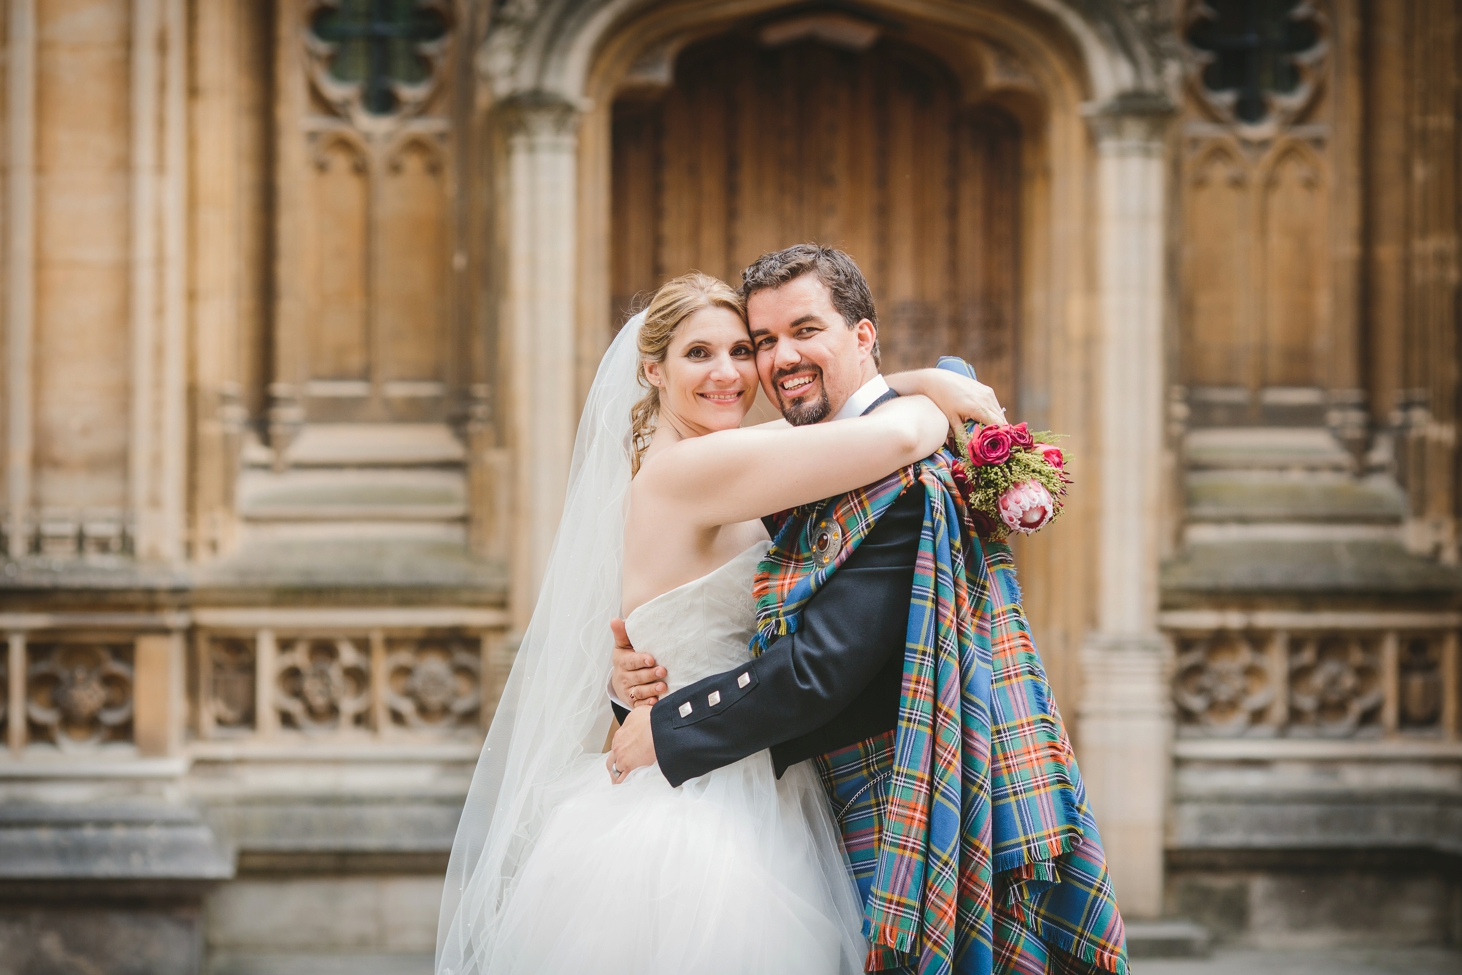 Oxford wedding photography Sarah Ann Wright_0100